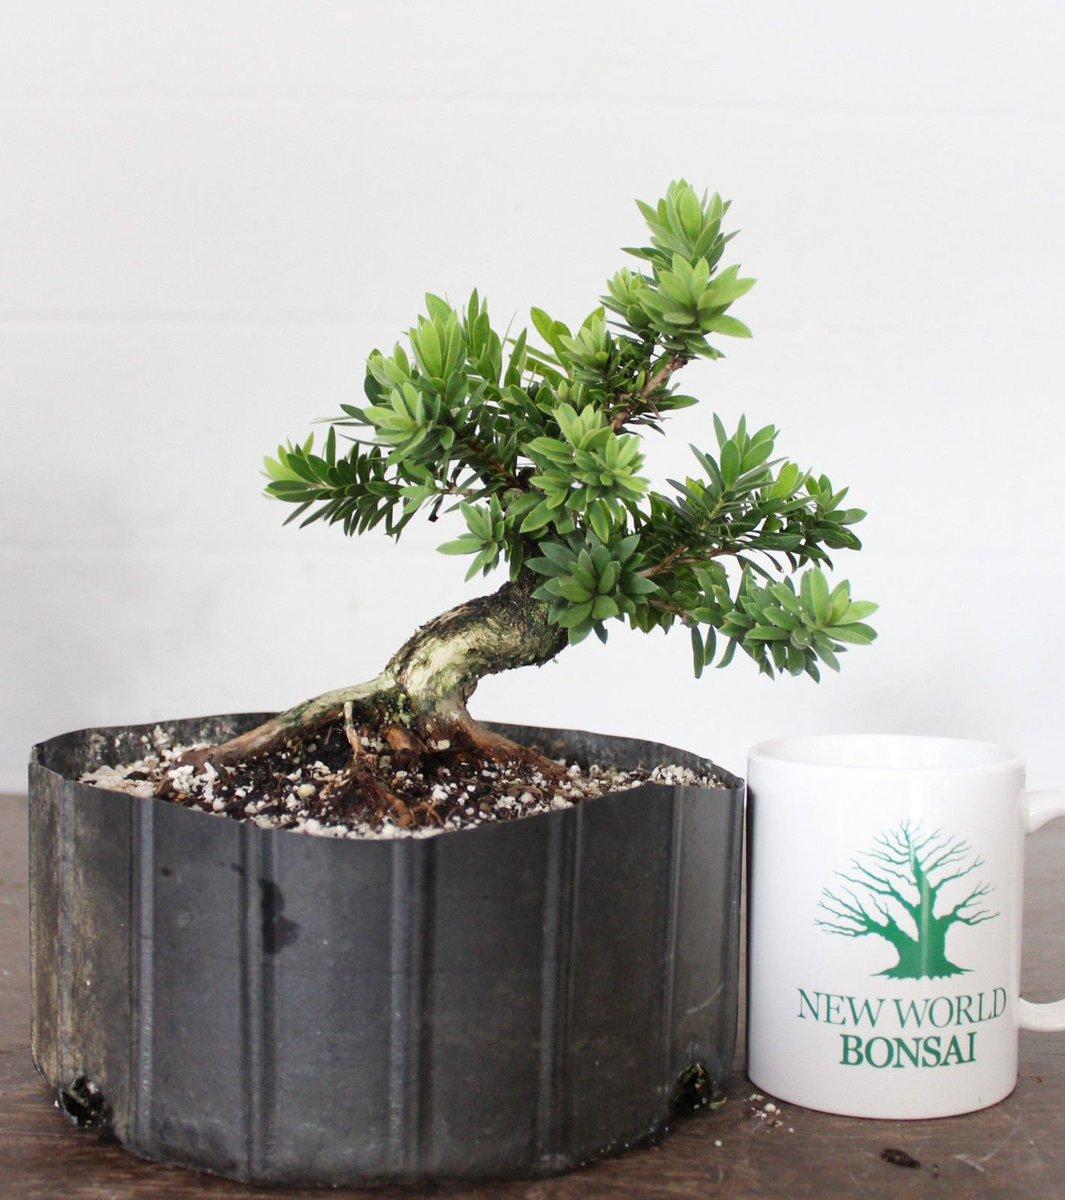 Wikibonsai Com On Twitter Dwarf Bottlebrush Flowering Bonsai Awesome Turnk Movement Quality Prebonsai Https T Co Sucdtzlyg2 Juniper Juniperusbrevifolia Juniperusphoenicea Https T Co Ooupznsste